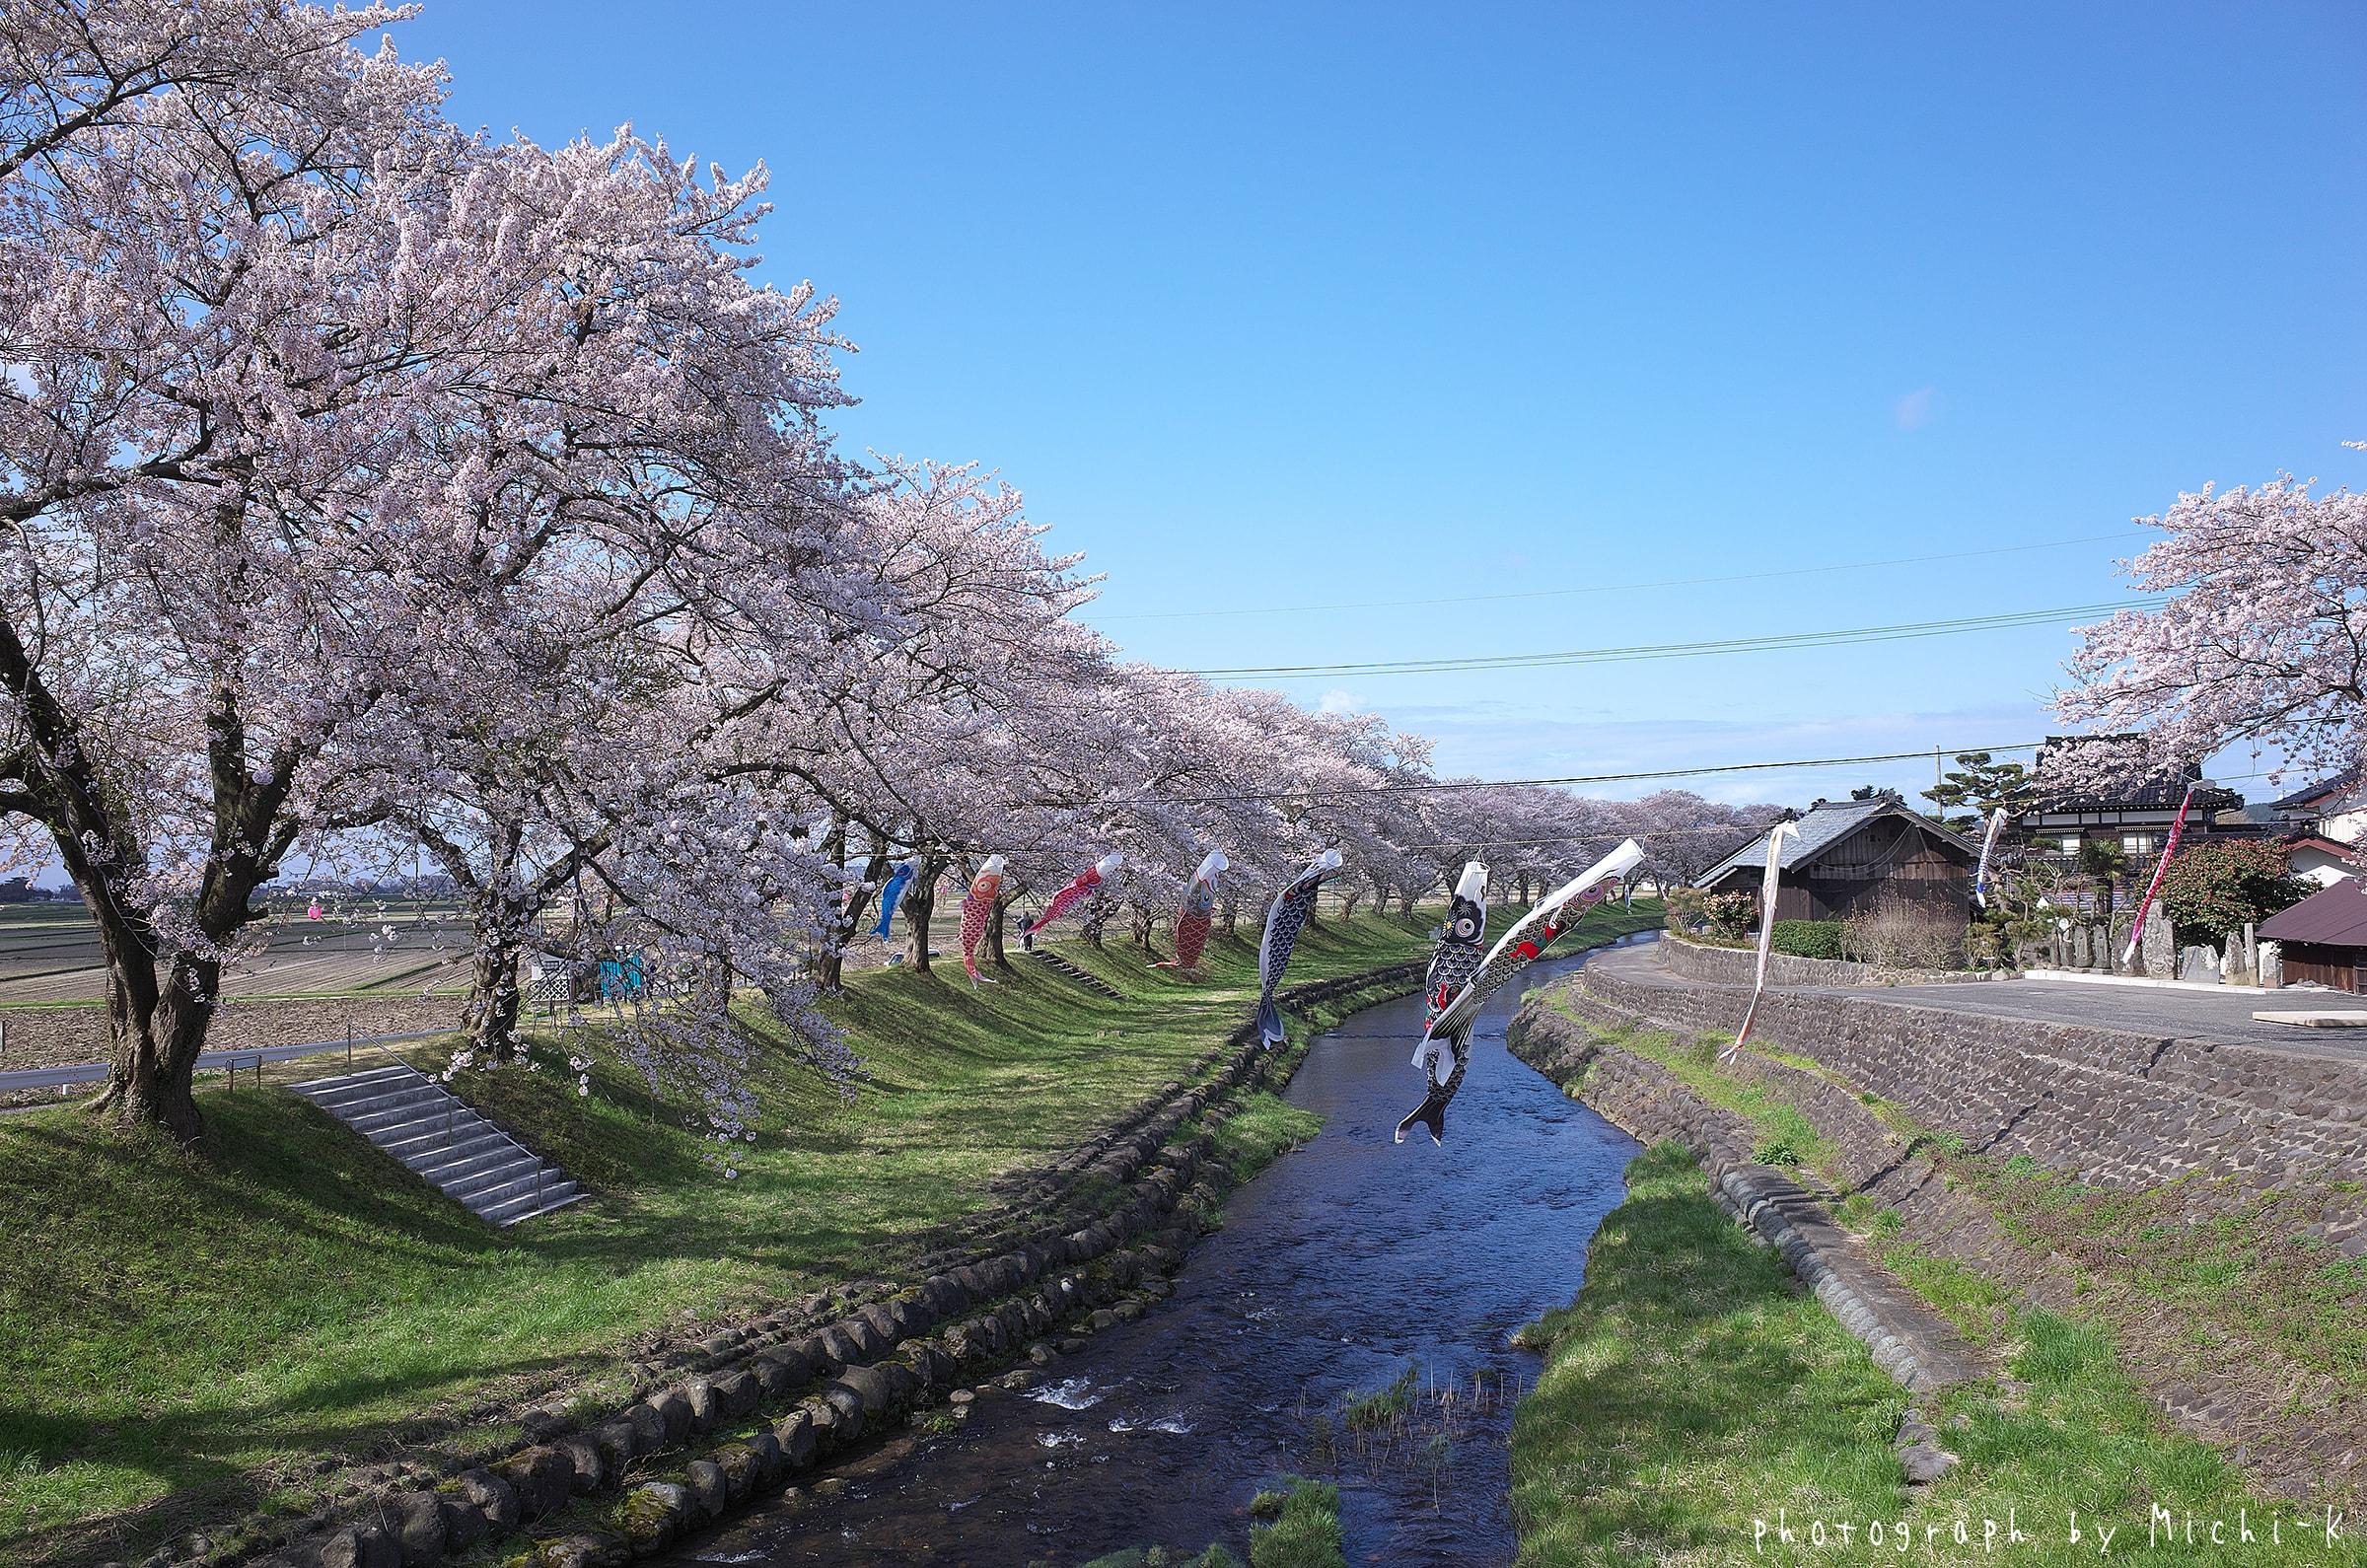 2017山形県遊佐町、中山河川公園の桜No.3